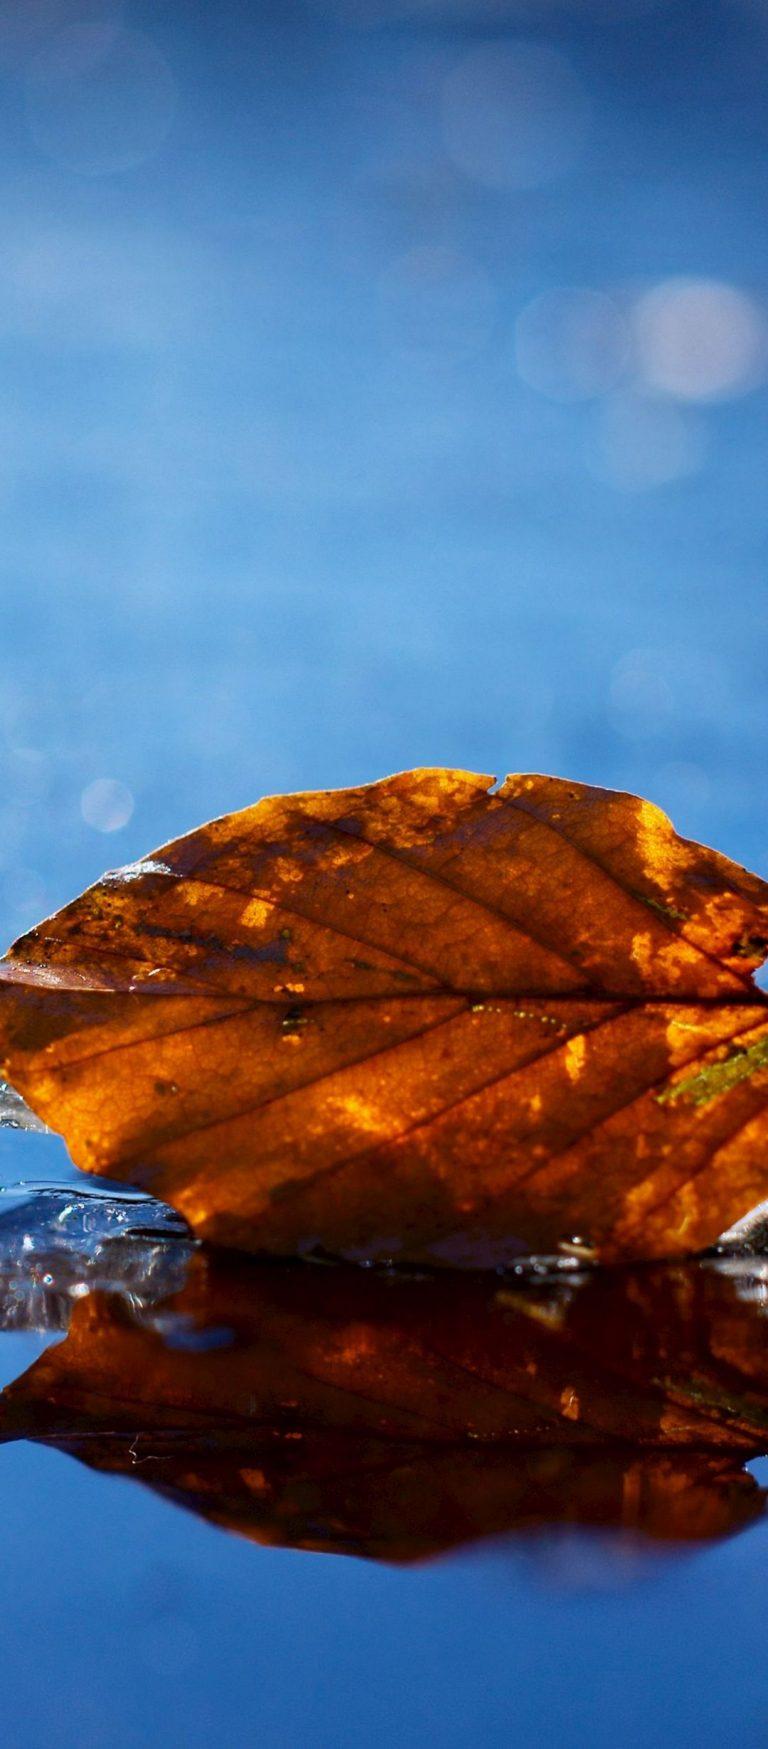 Leaf Autumn Fallen Dry Water Liquid 1080x2460 768x1749